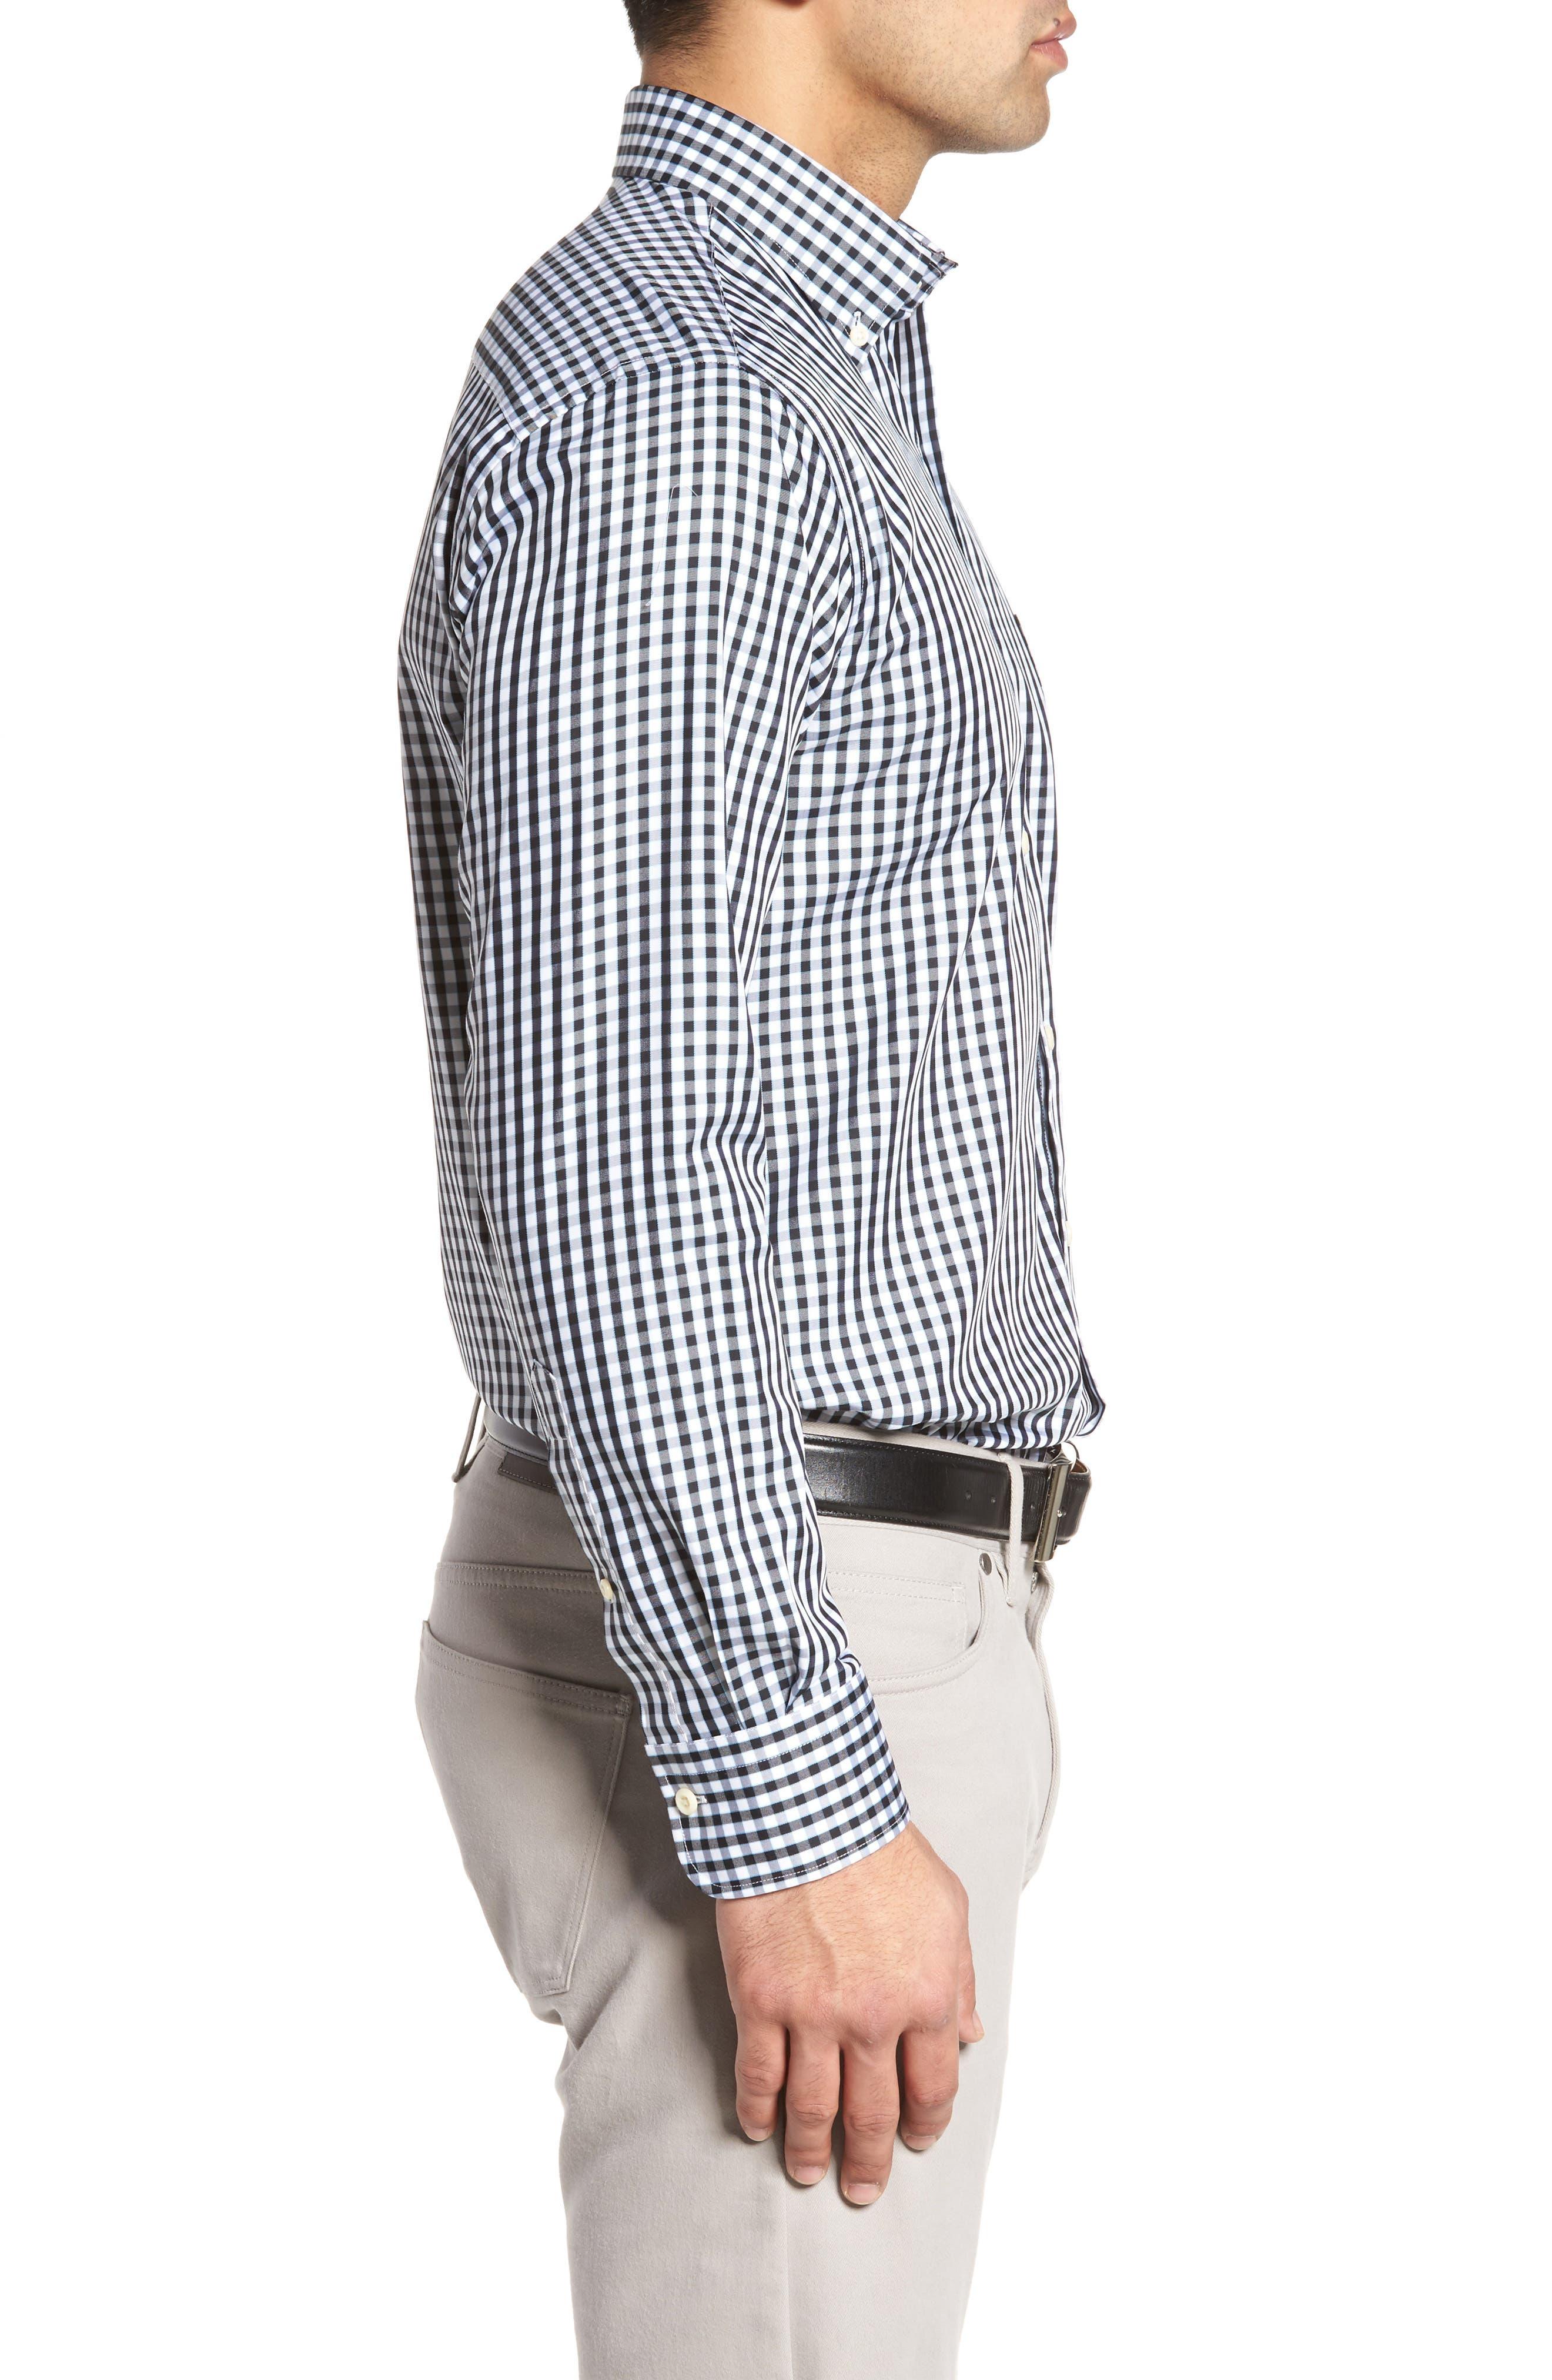 PETER MILLAR, Black Sand Regular Fit Gingham Check Sport Shirt, Alternate thumbnail 3, color, BLACK